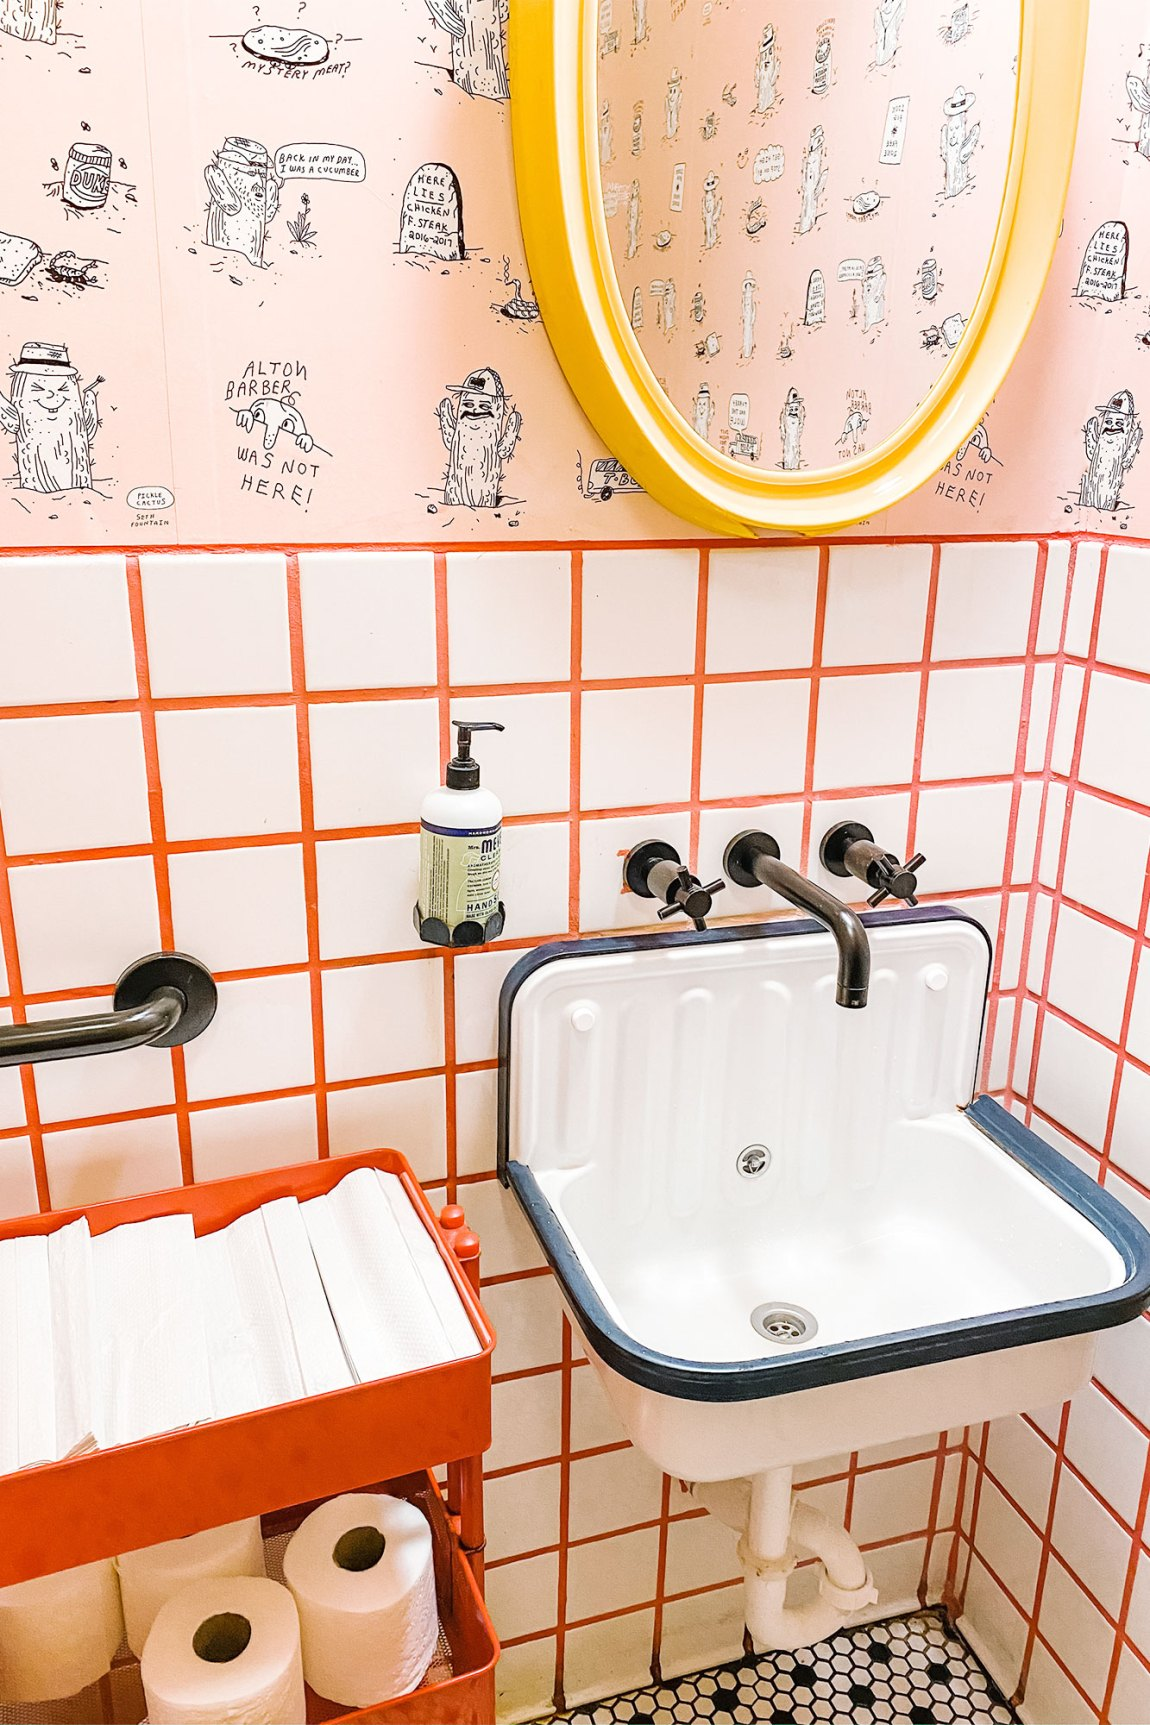 Brightly colored bathroom